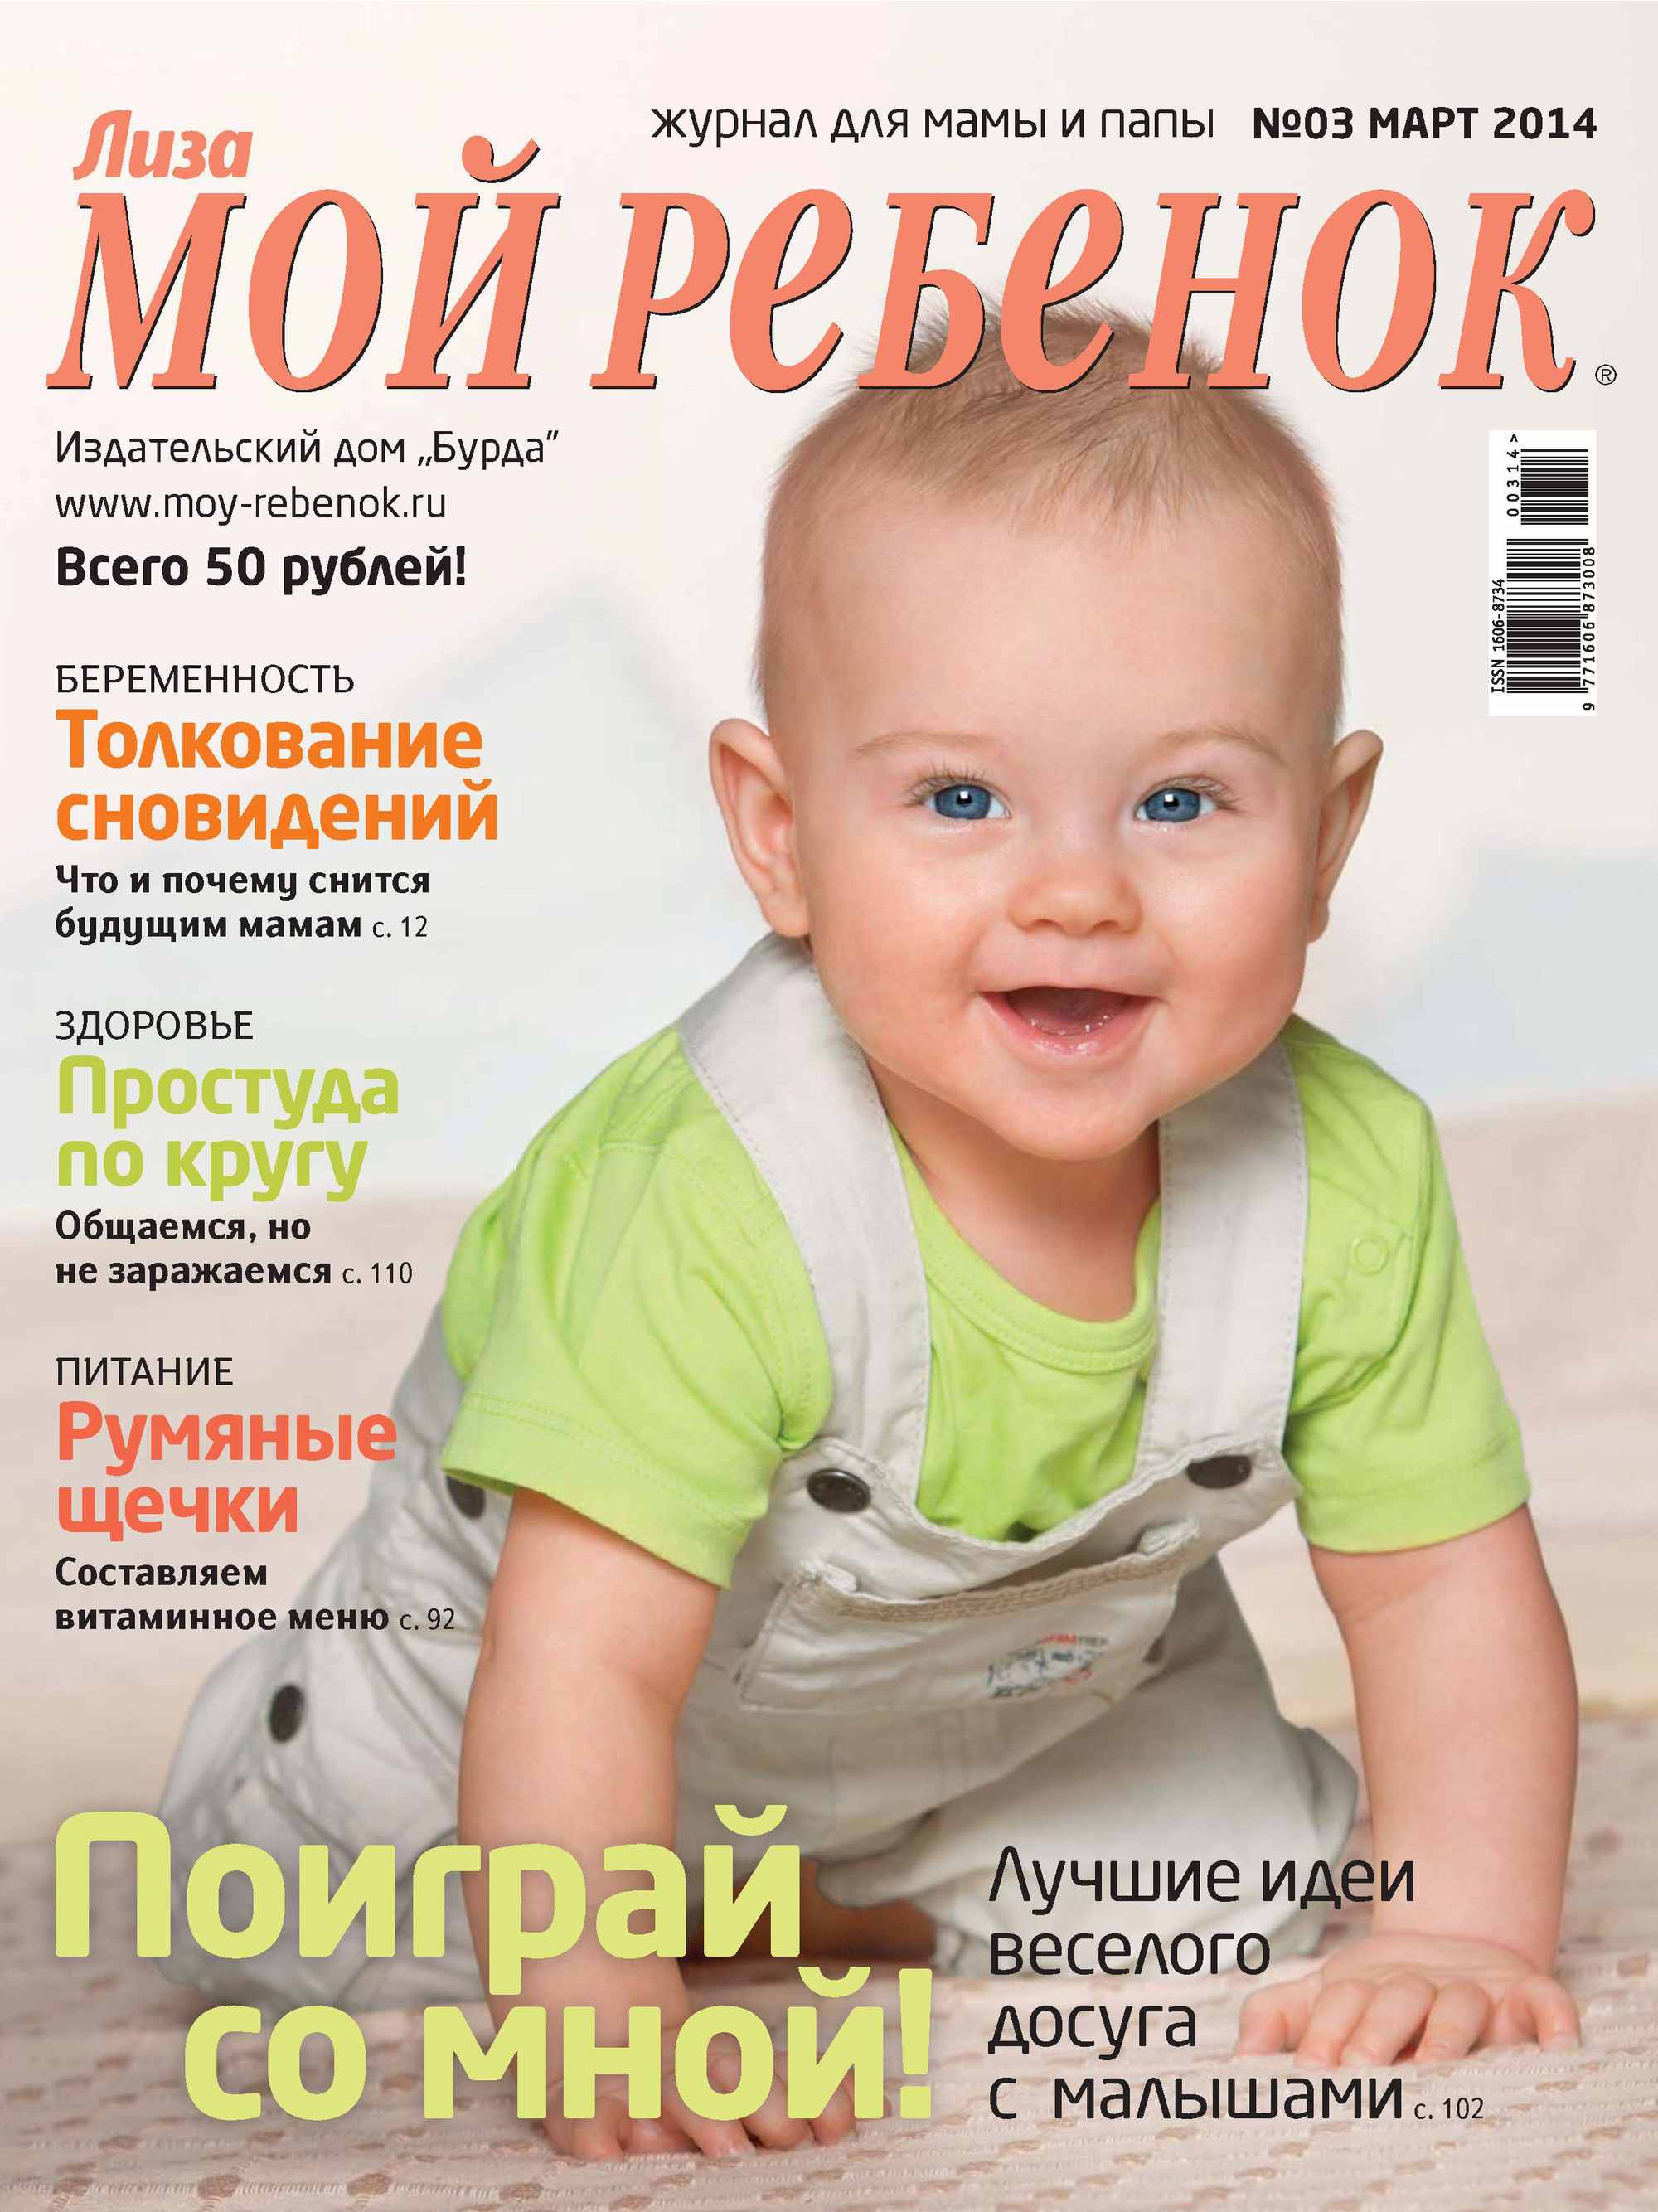 ИД «Бурда» Журнал «Лиза. Мой ребенок» №03/2014 ид бурда журнал лиза мой ребенок 03 2014